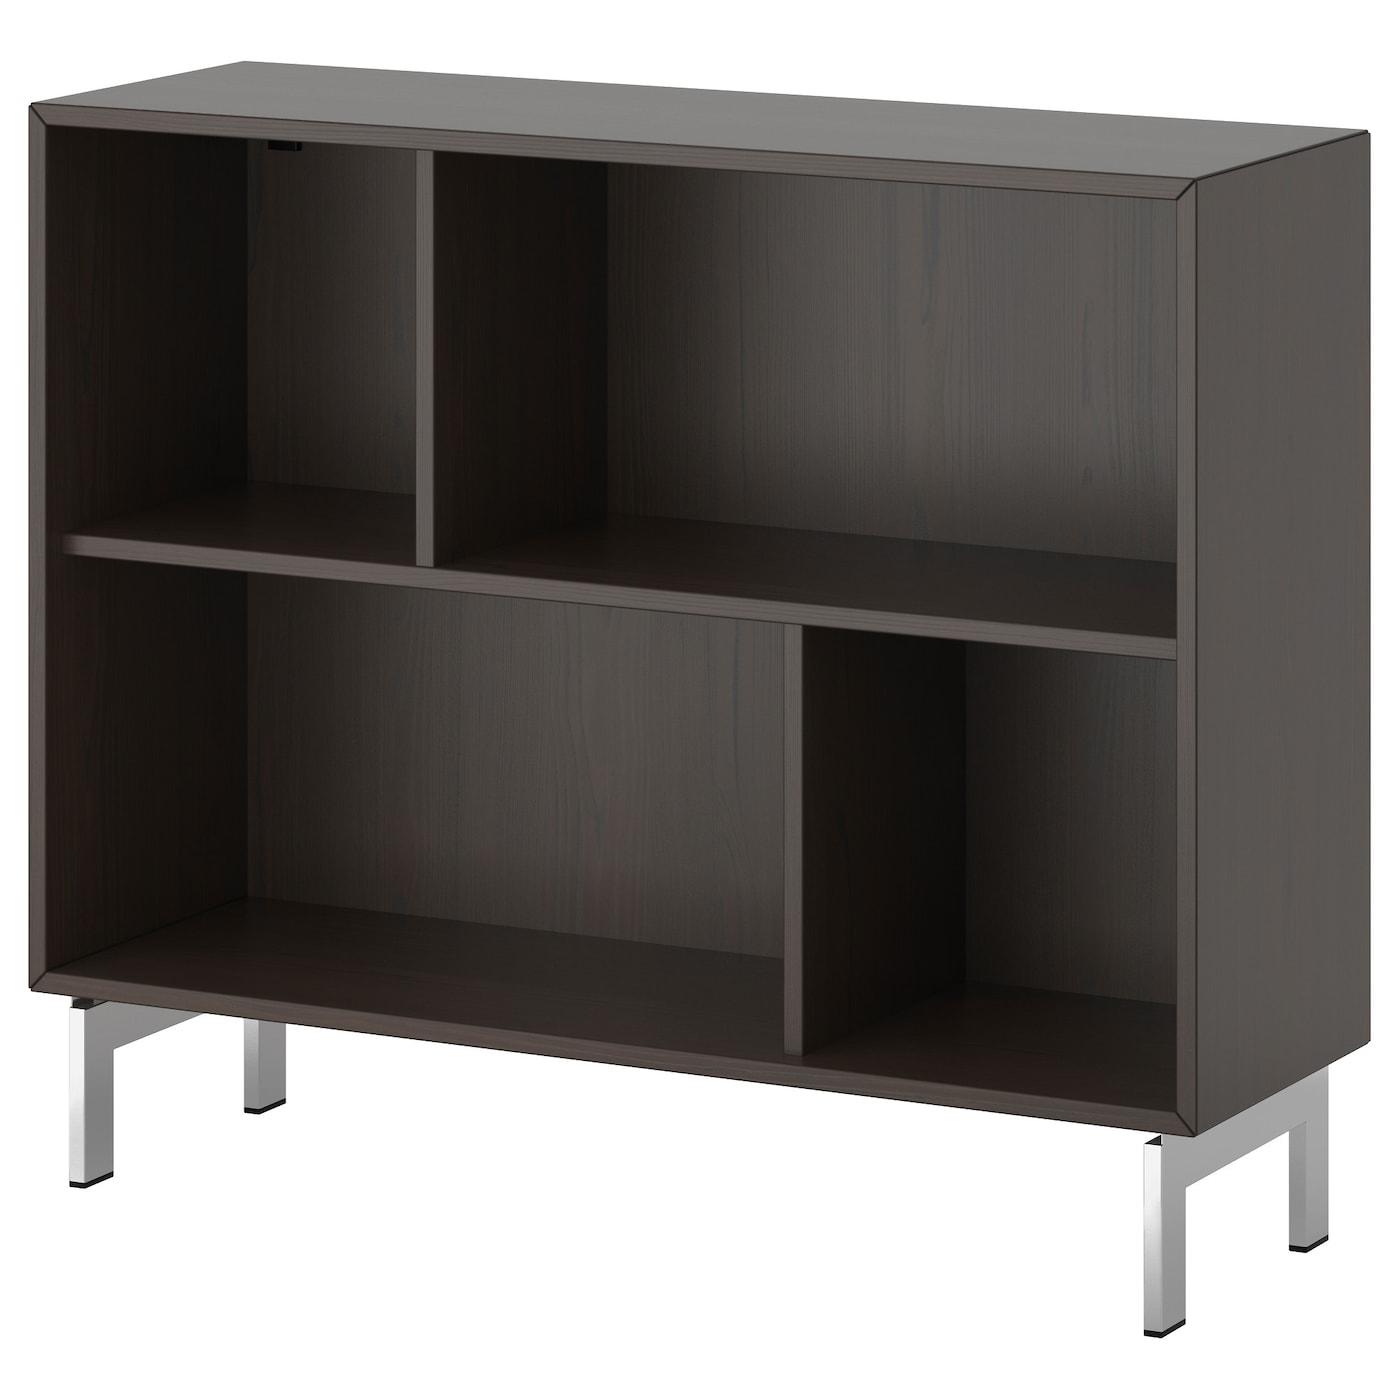 IKEA VALJE Shelf Unit Optimise Your Storage With PALLRA Boxes, Or PALLRA  Mini Chests.